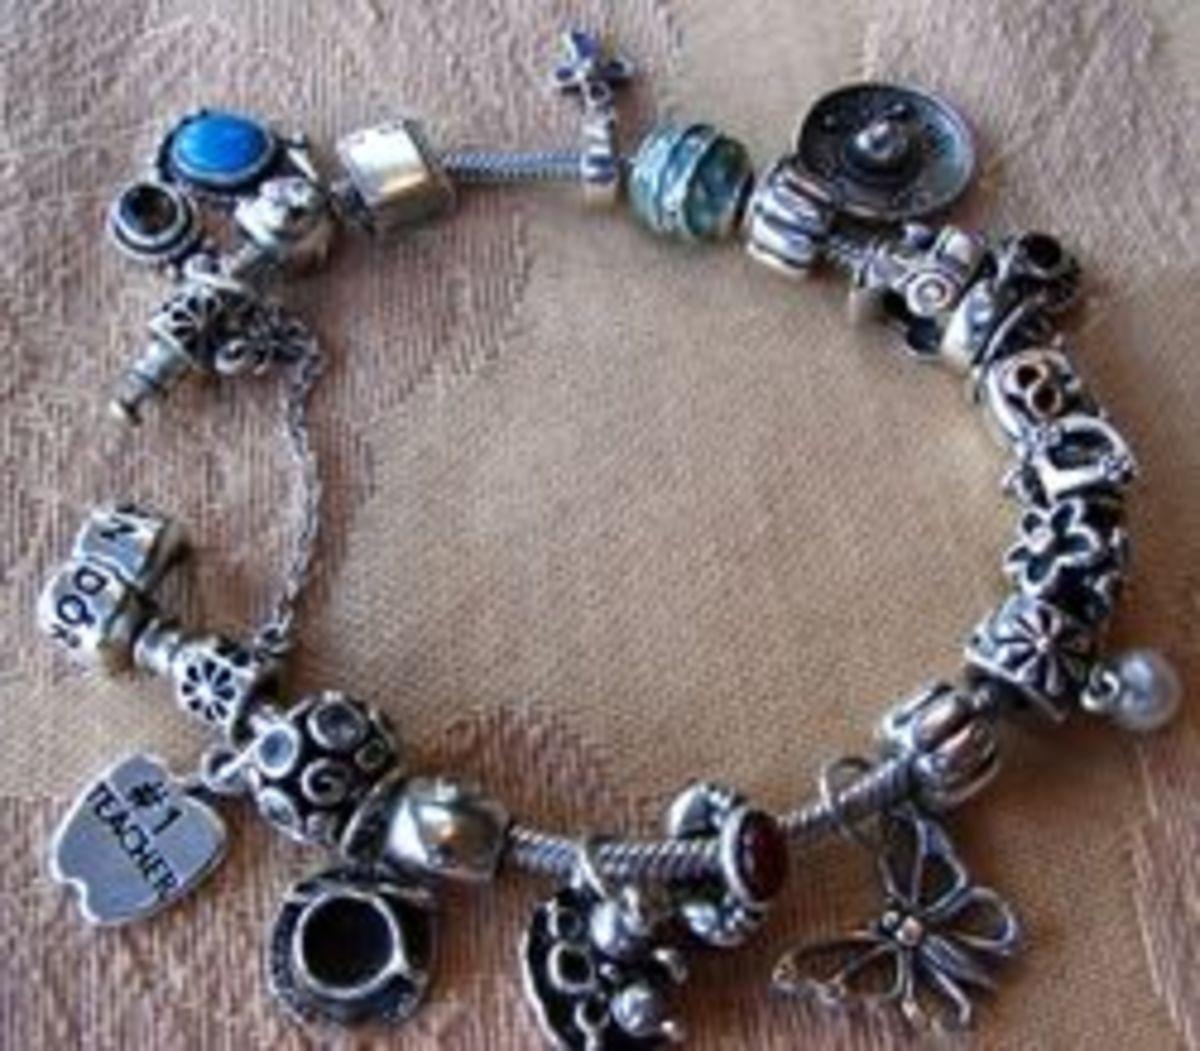 Adapting Vintage Charms to a Pandora Charm Bracelet